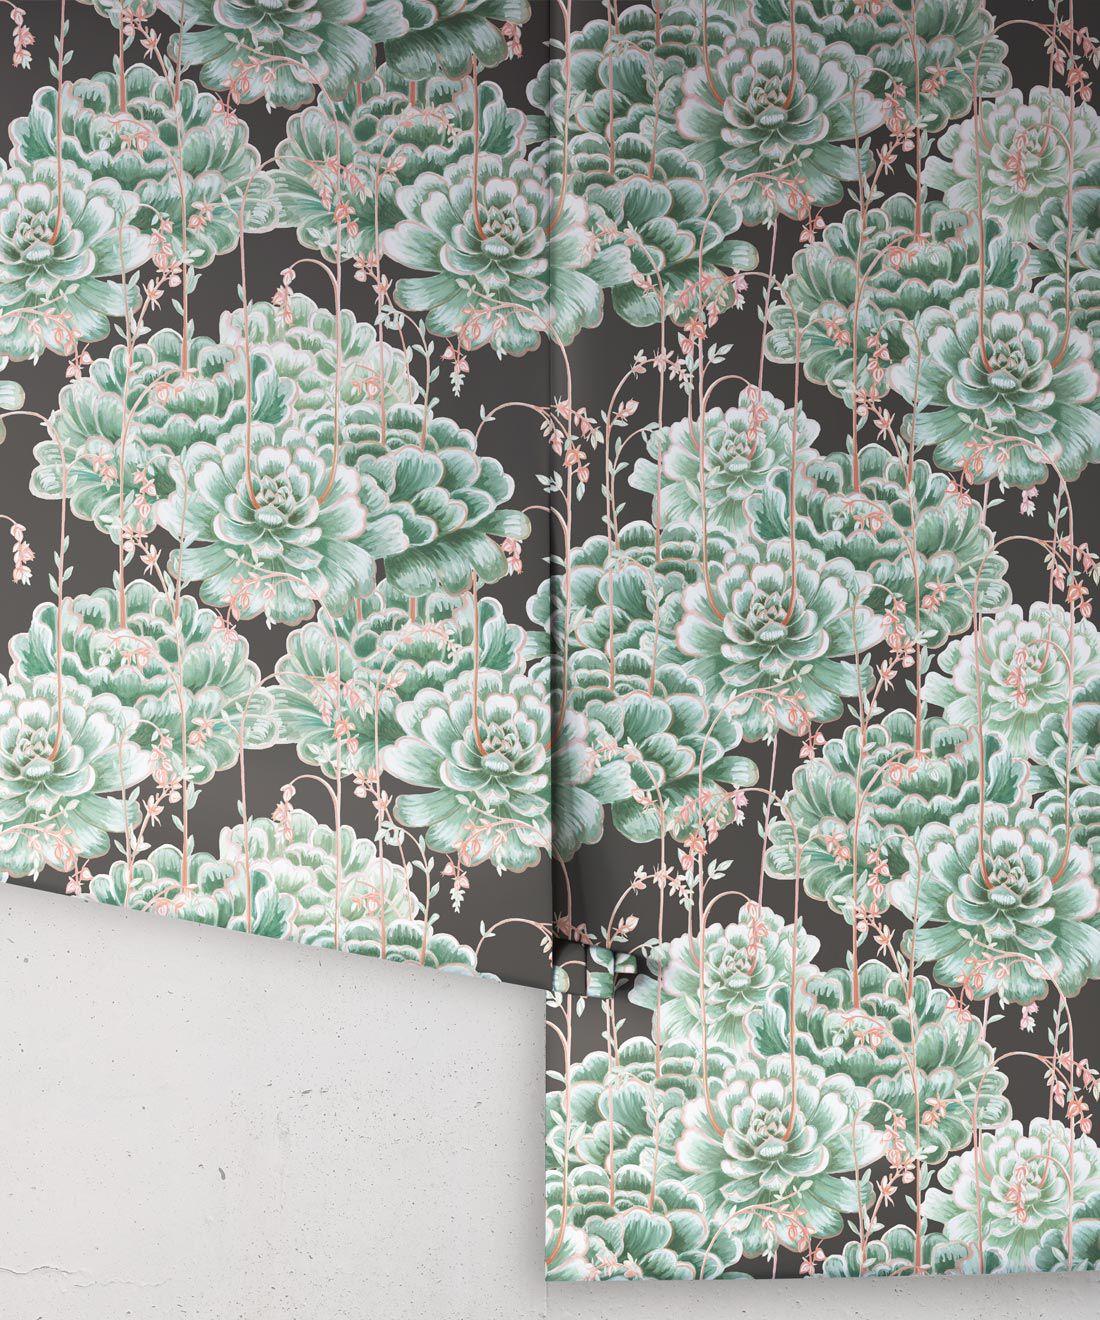 Succulents Wallpaper Green Charcoal • Cactus Wallpaper • Desert Wallpaper rolls on black background